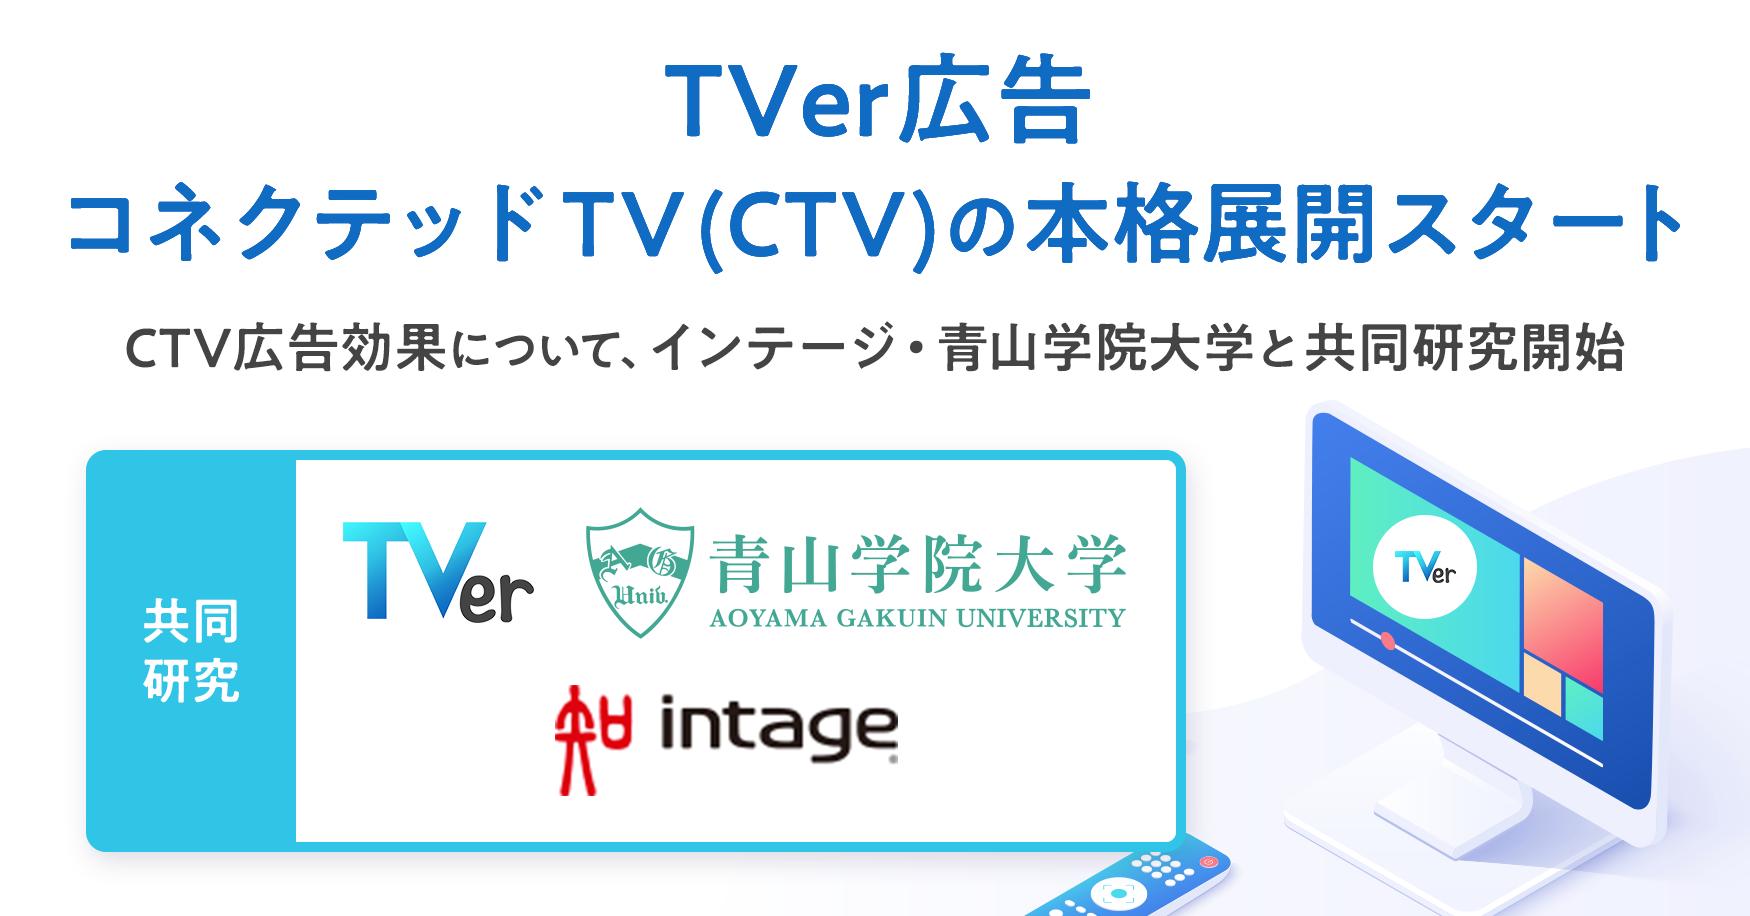 TVer広告において、コネクテッドTVの本格展開スタート CTV広告効果について、インテージ・青山学院大学と共同研究開始 〜連携第一弾として、インテージとCTV調査スキームを共同リリース